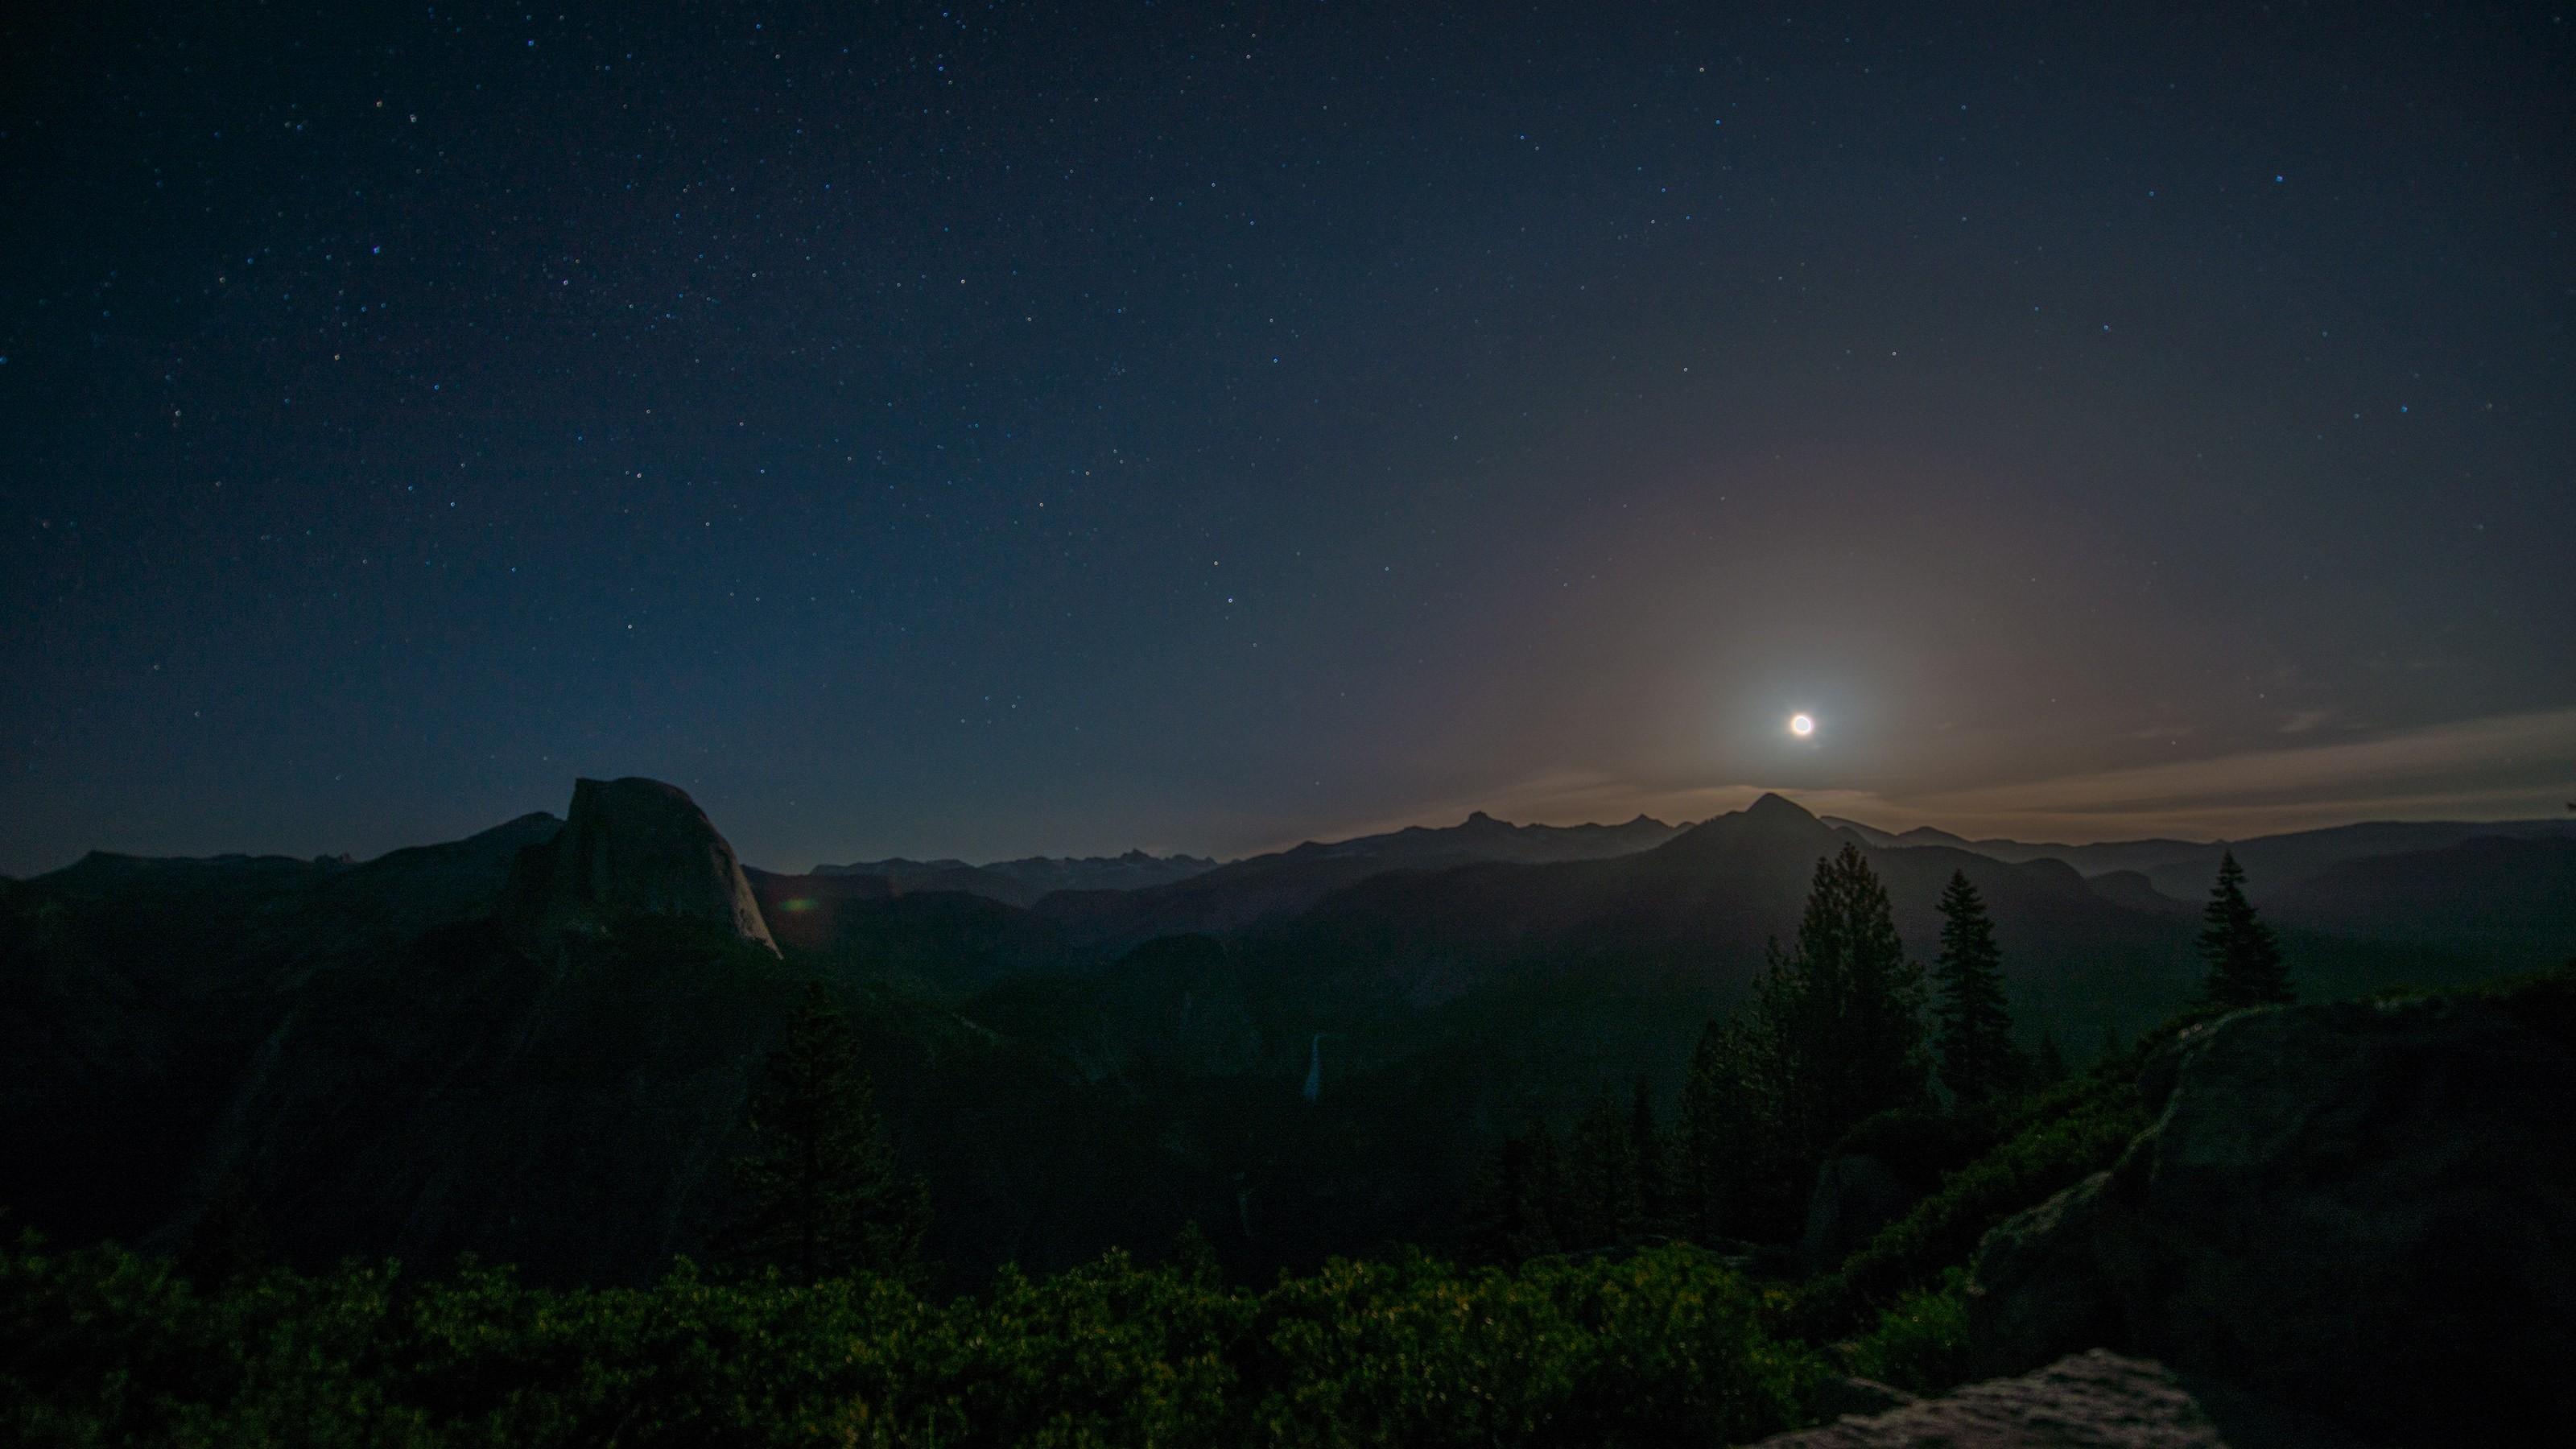 Wallpaper forest mountains night nature sky moon - 3200x1800 wallpaper ...